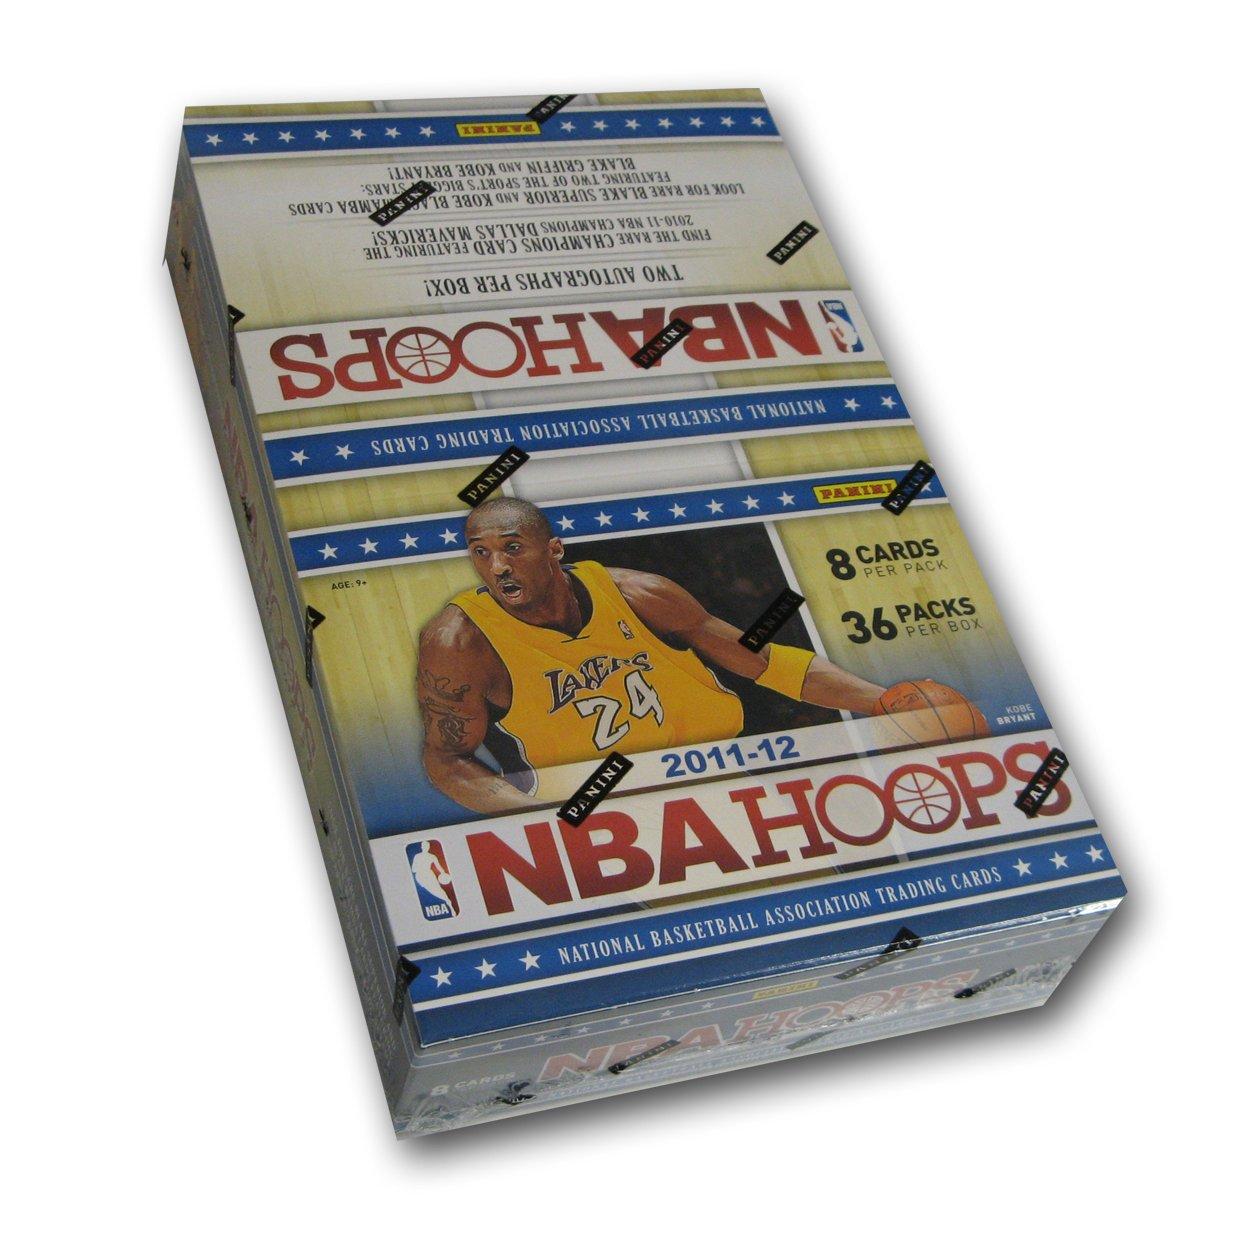 2011/12 Panini NBA Hoops Basketball Hobby Box PAN112BKTHH